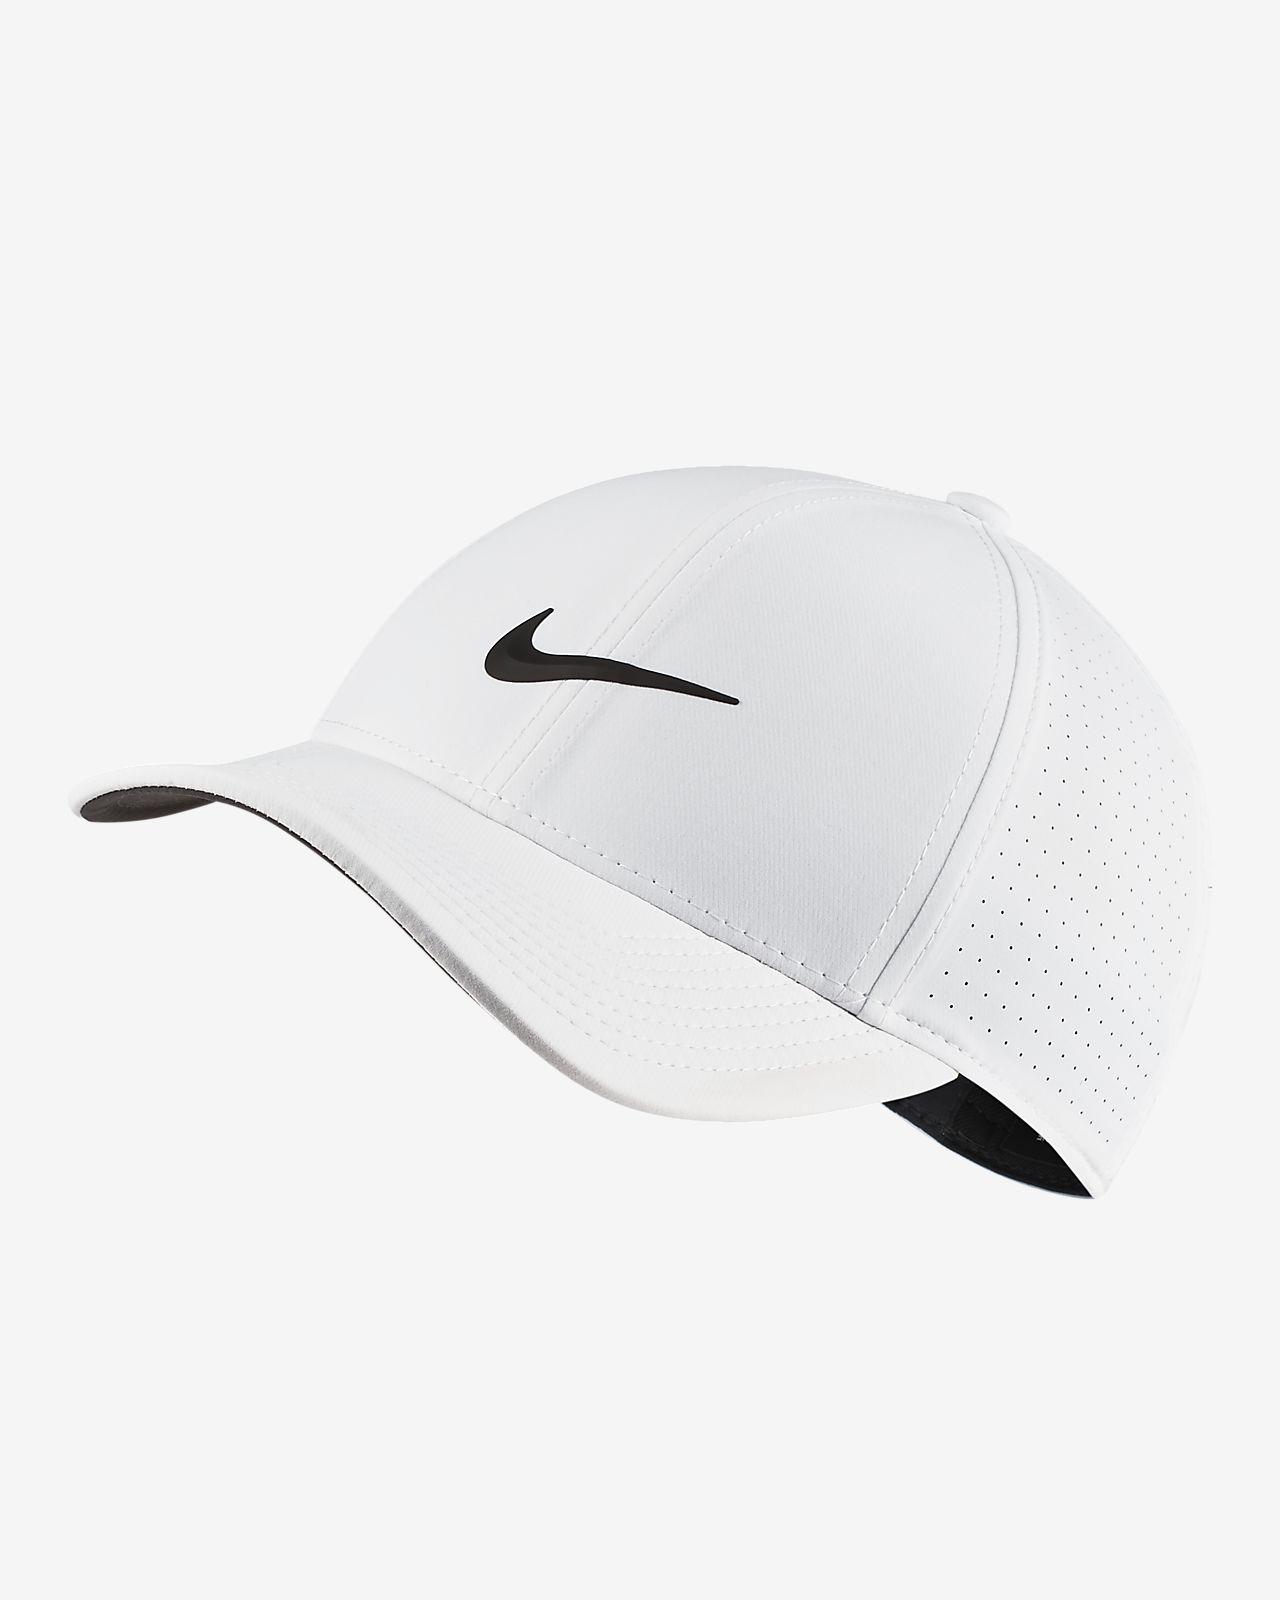 6a0ebffde30d14 Nike AeroBill Legacy 91 Fitted Golf Hat. Nike.com SE